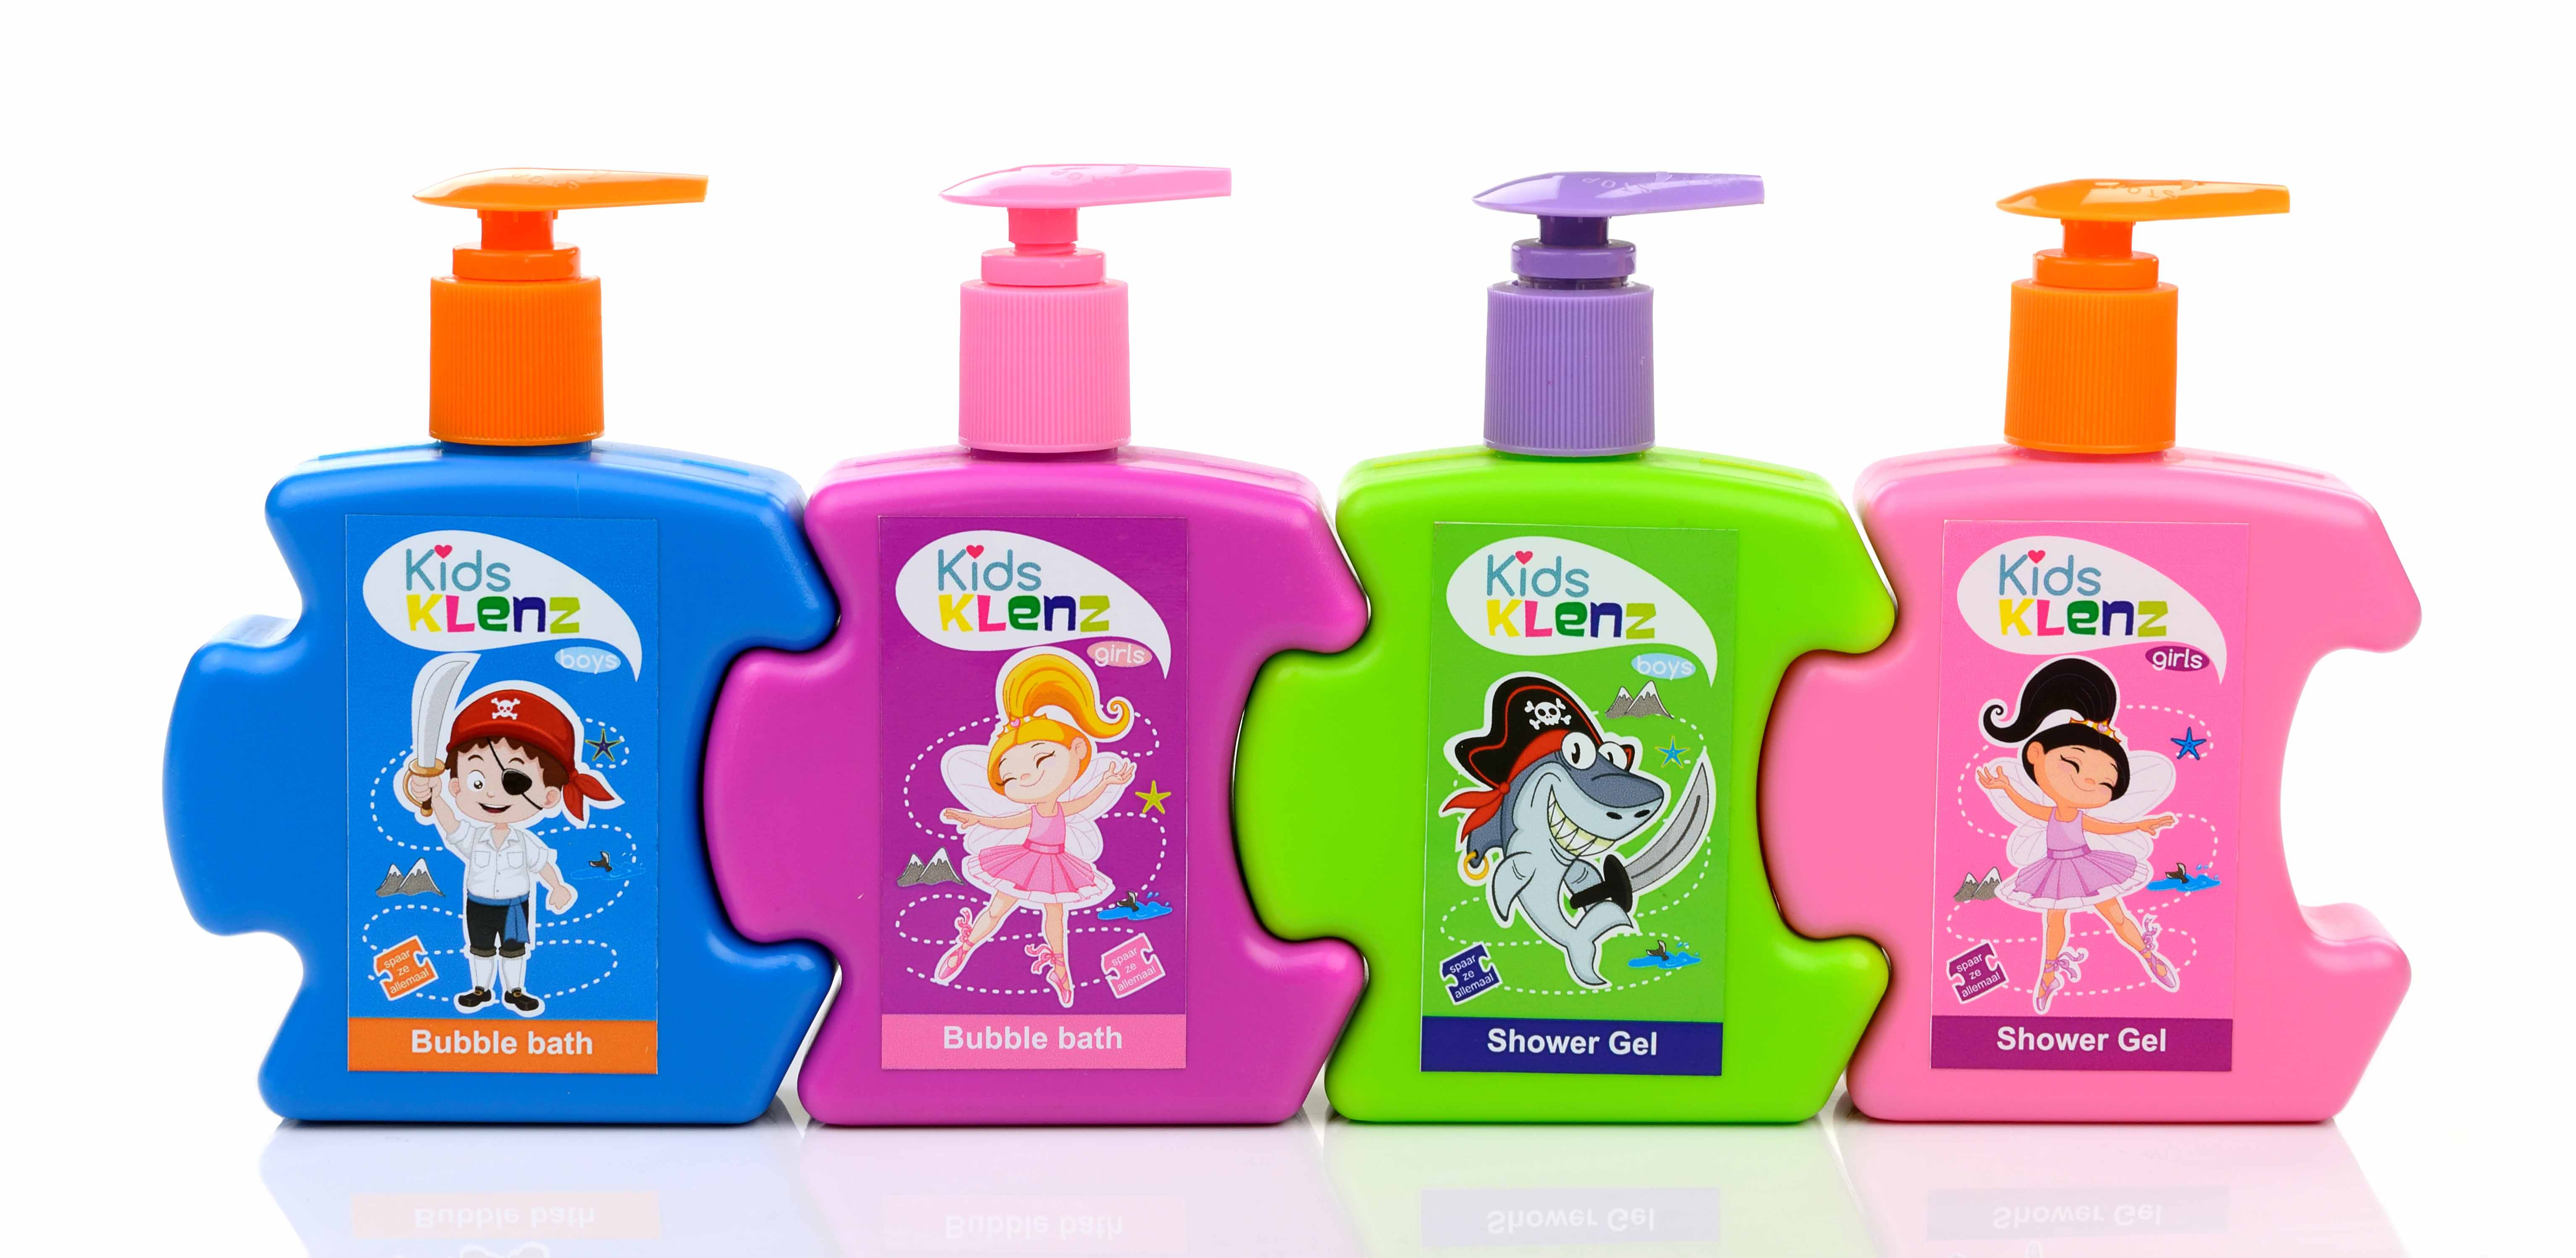 Kids Klendz Girls Bubble Bath_review Kids Klenz bath-ervaringen-Kids Klenz